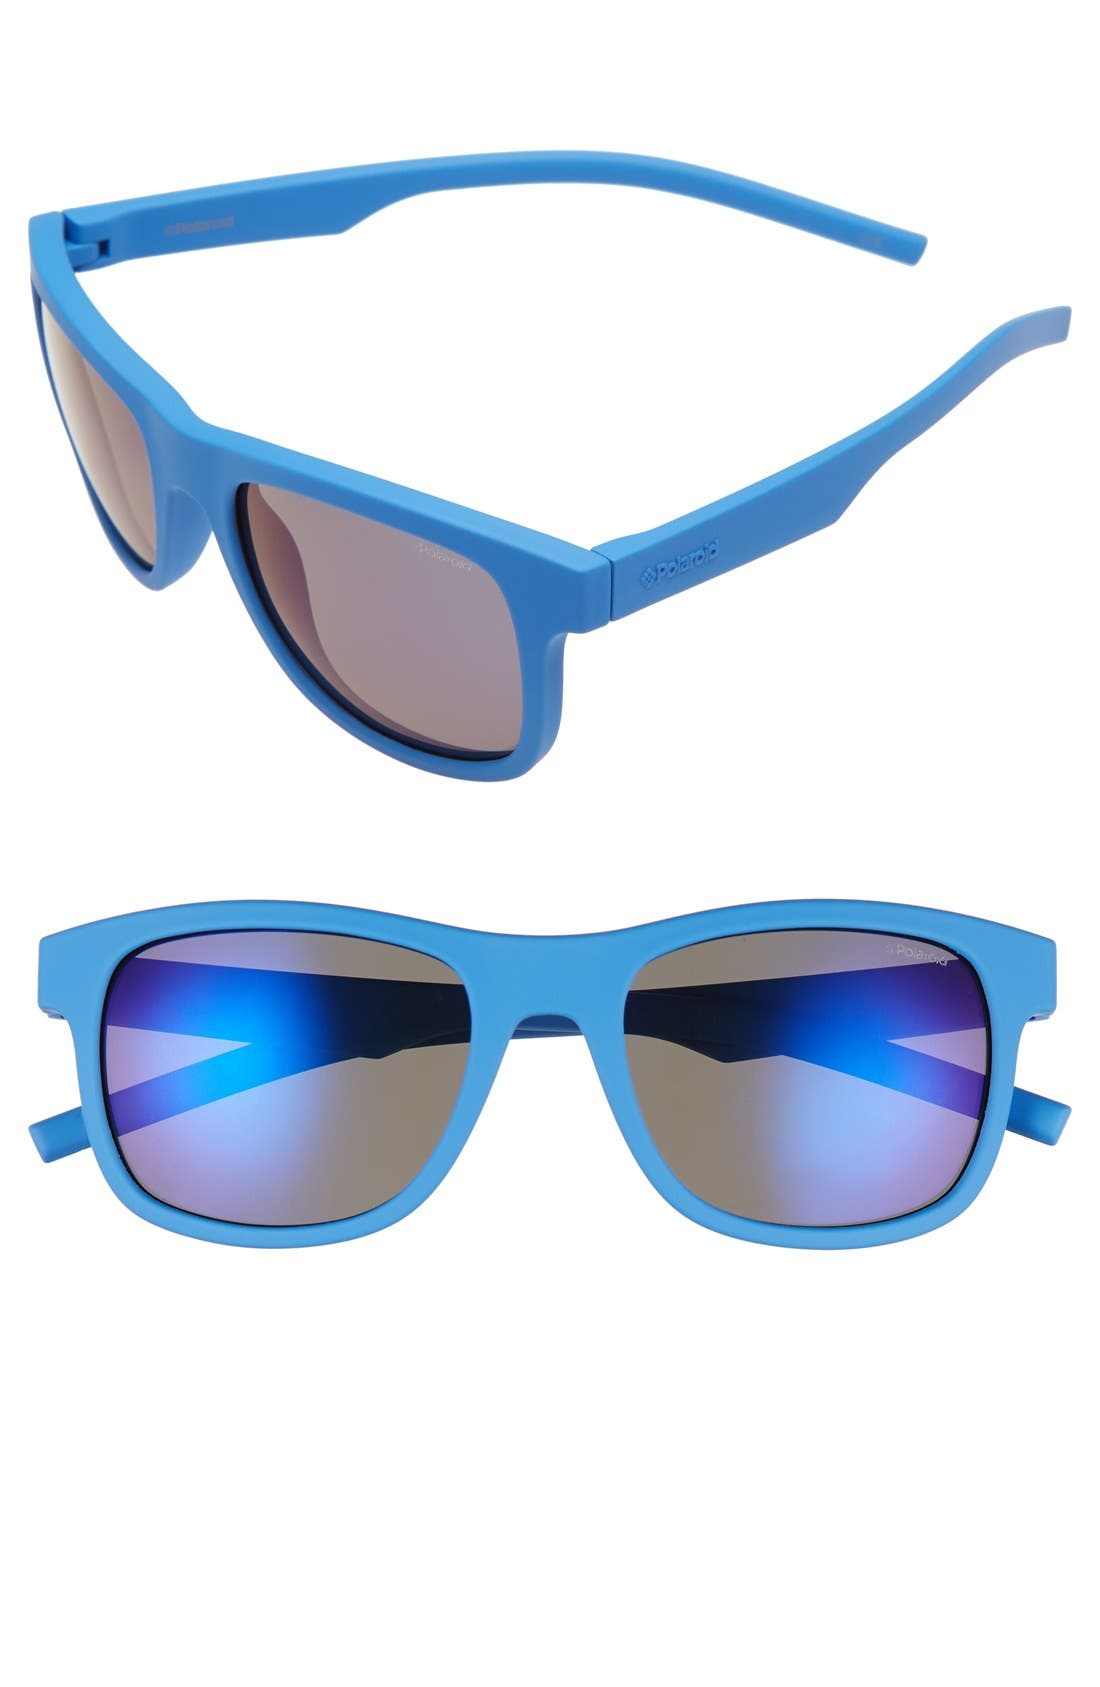 Polaroid 51mm Polarized Retro Sunglasses